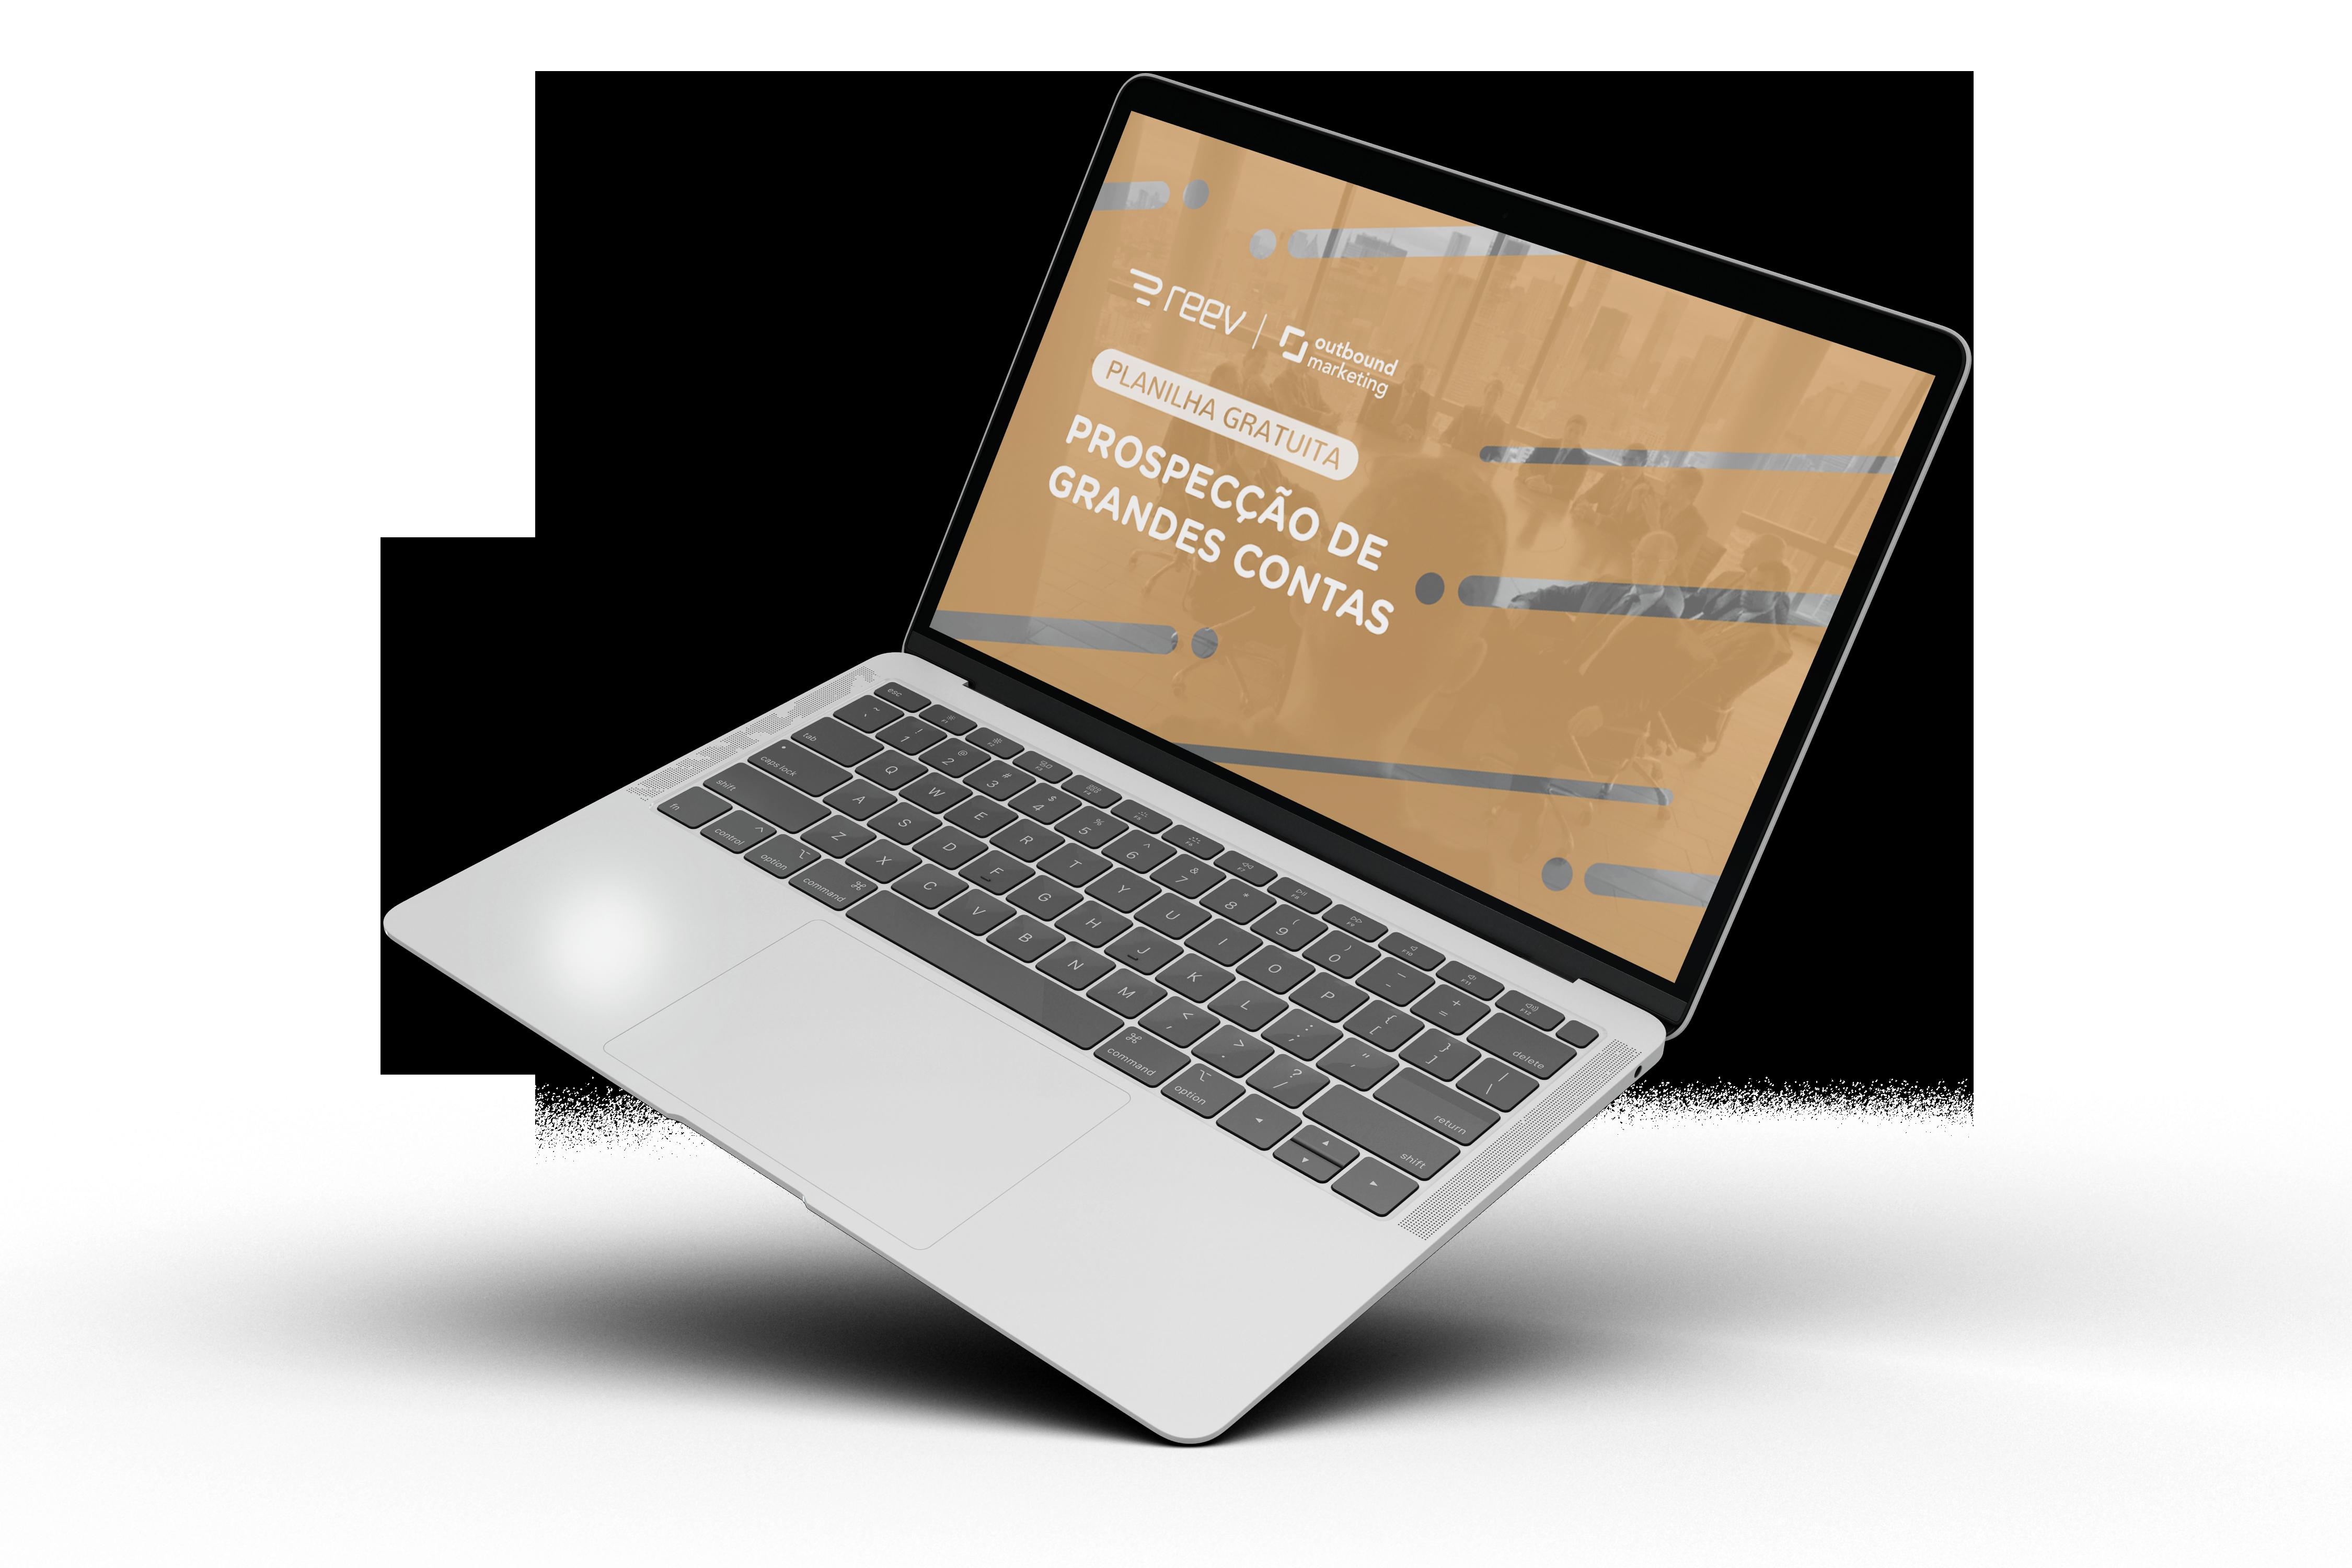 notebook-mockup-planilha-prospeccao-grandes-contas-fundo-transparente